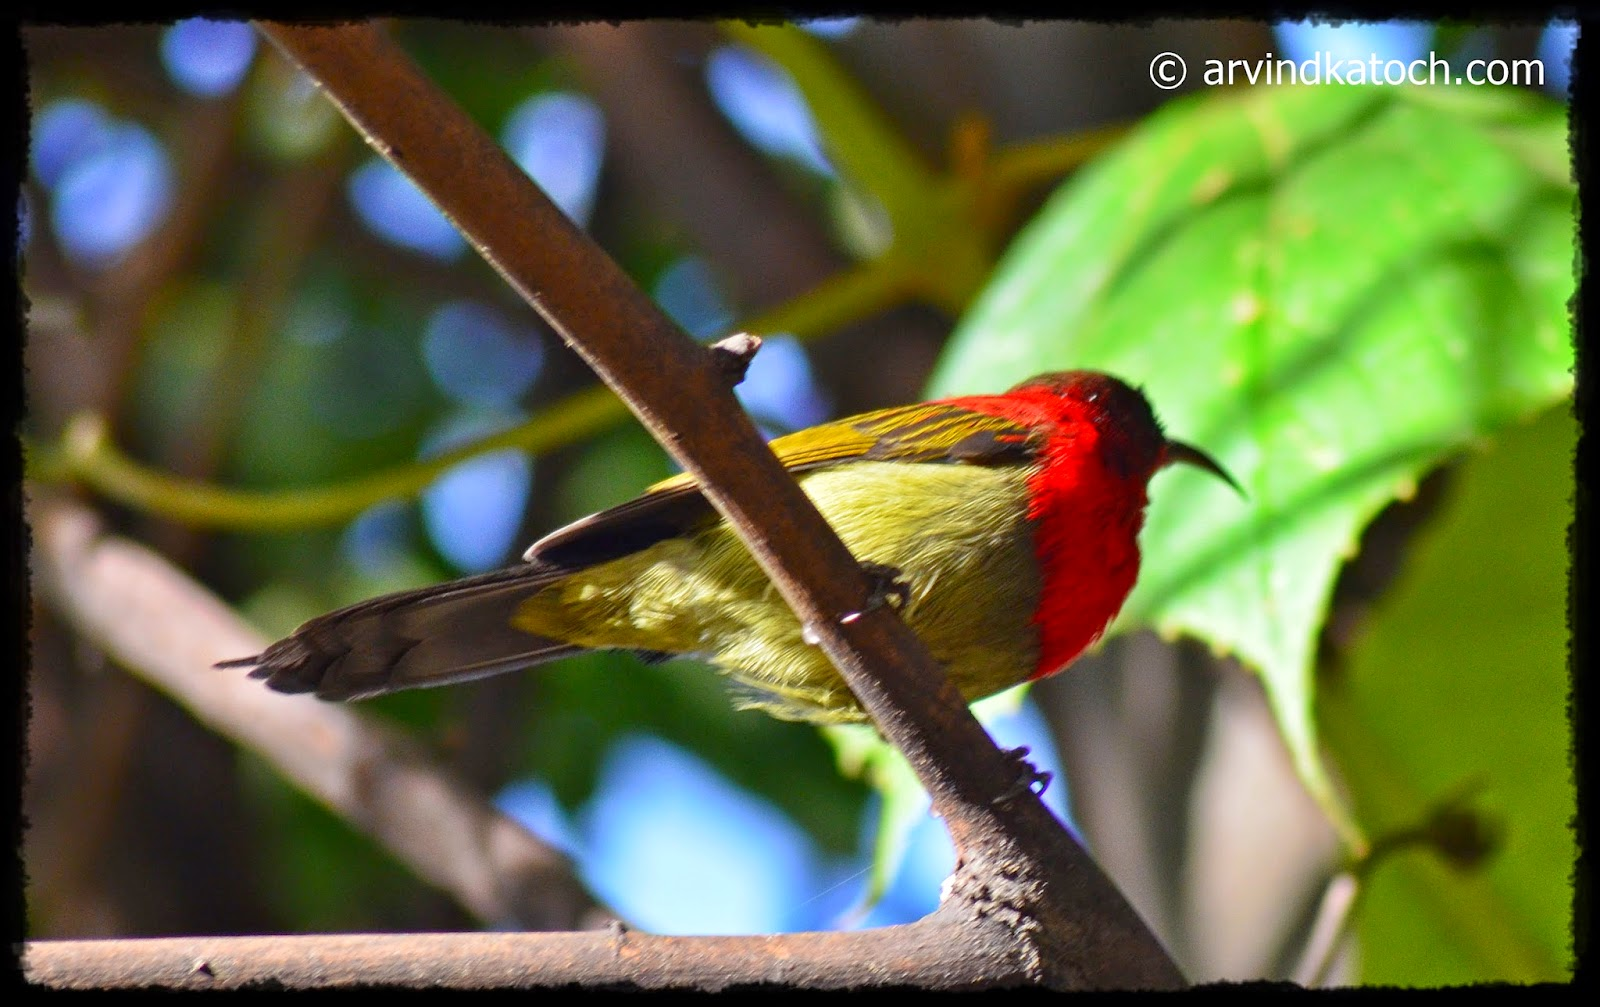 Crimson Sunbird, Bottom, Sunbird